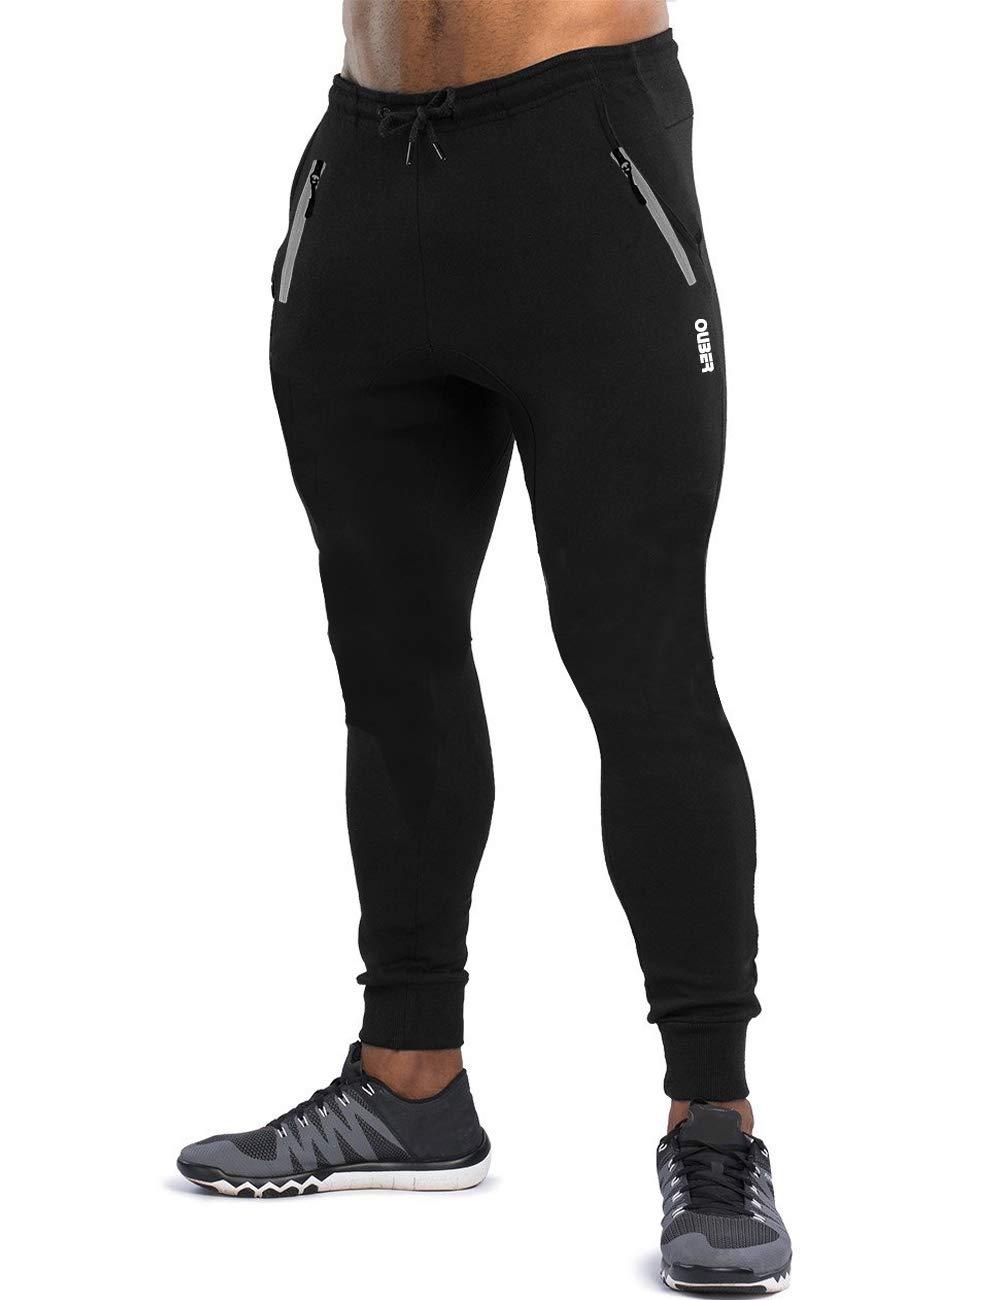 Ouber Men's Slim Fit Joggers Workout Sports Fleece Sweatpants for Gym Training (Black,S)